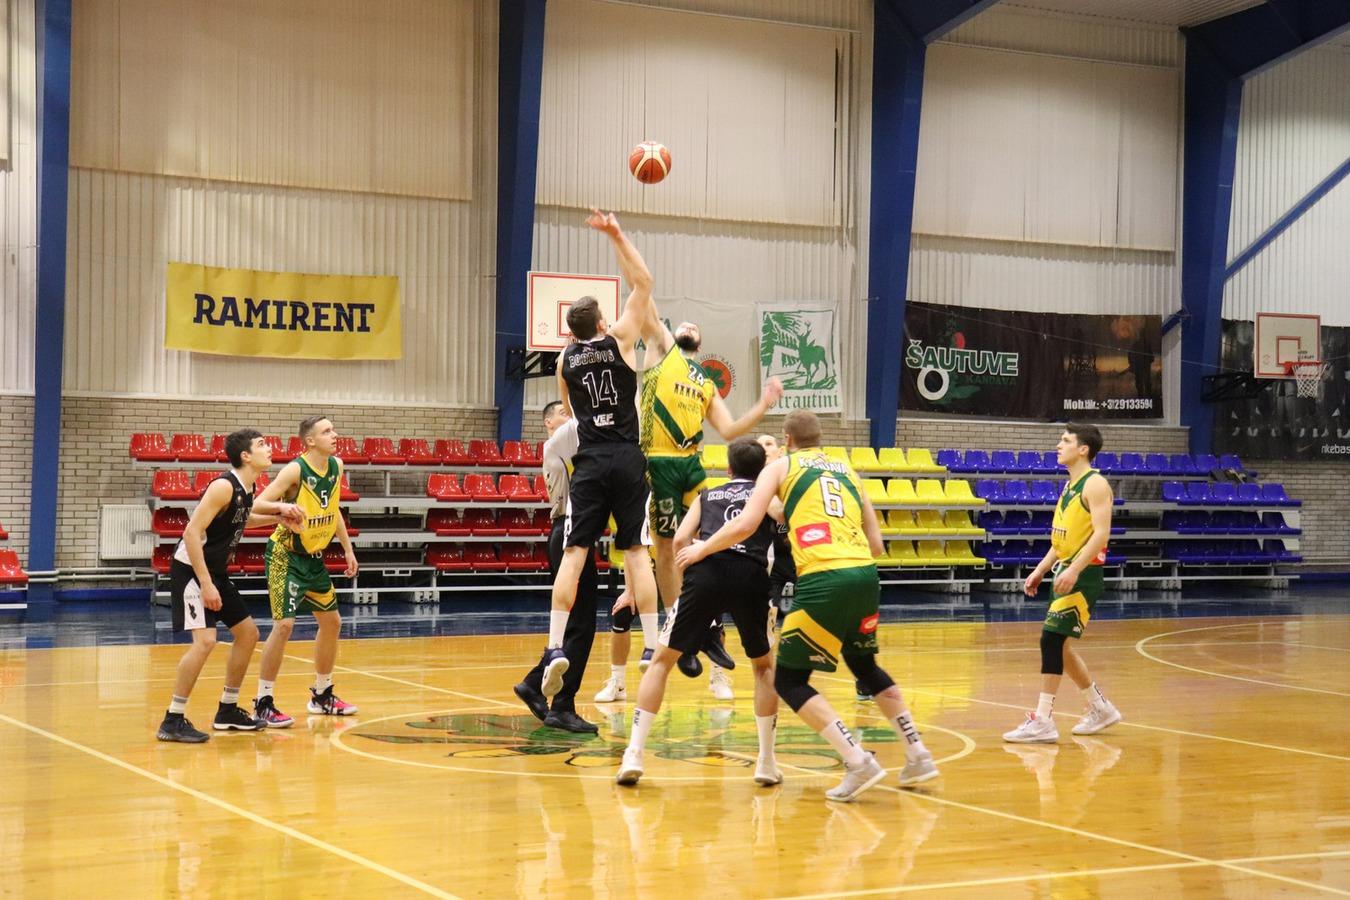 http___kandava_lv_dati_kandava_lbl2_basketbola_spele_bk_kandava_anzage_pret_a_kraukla_skolu_img_3192.jpg